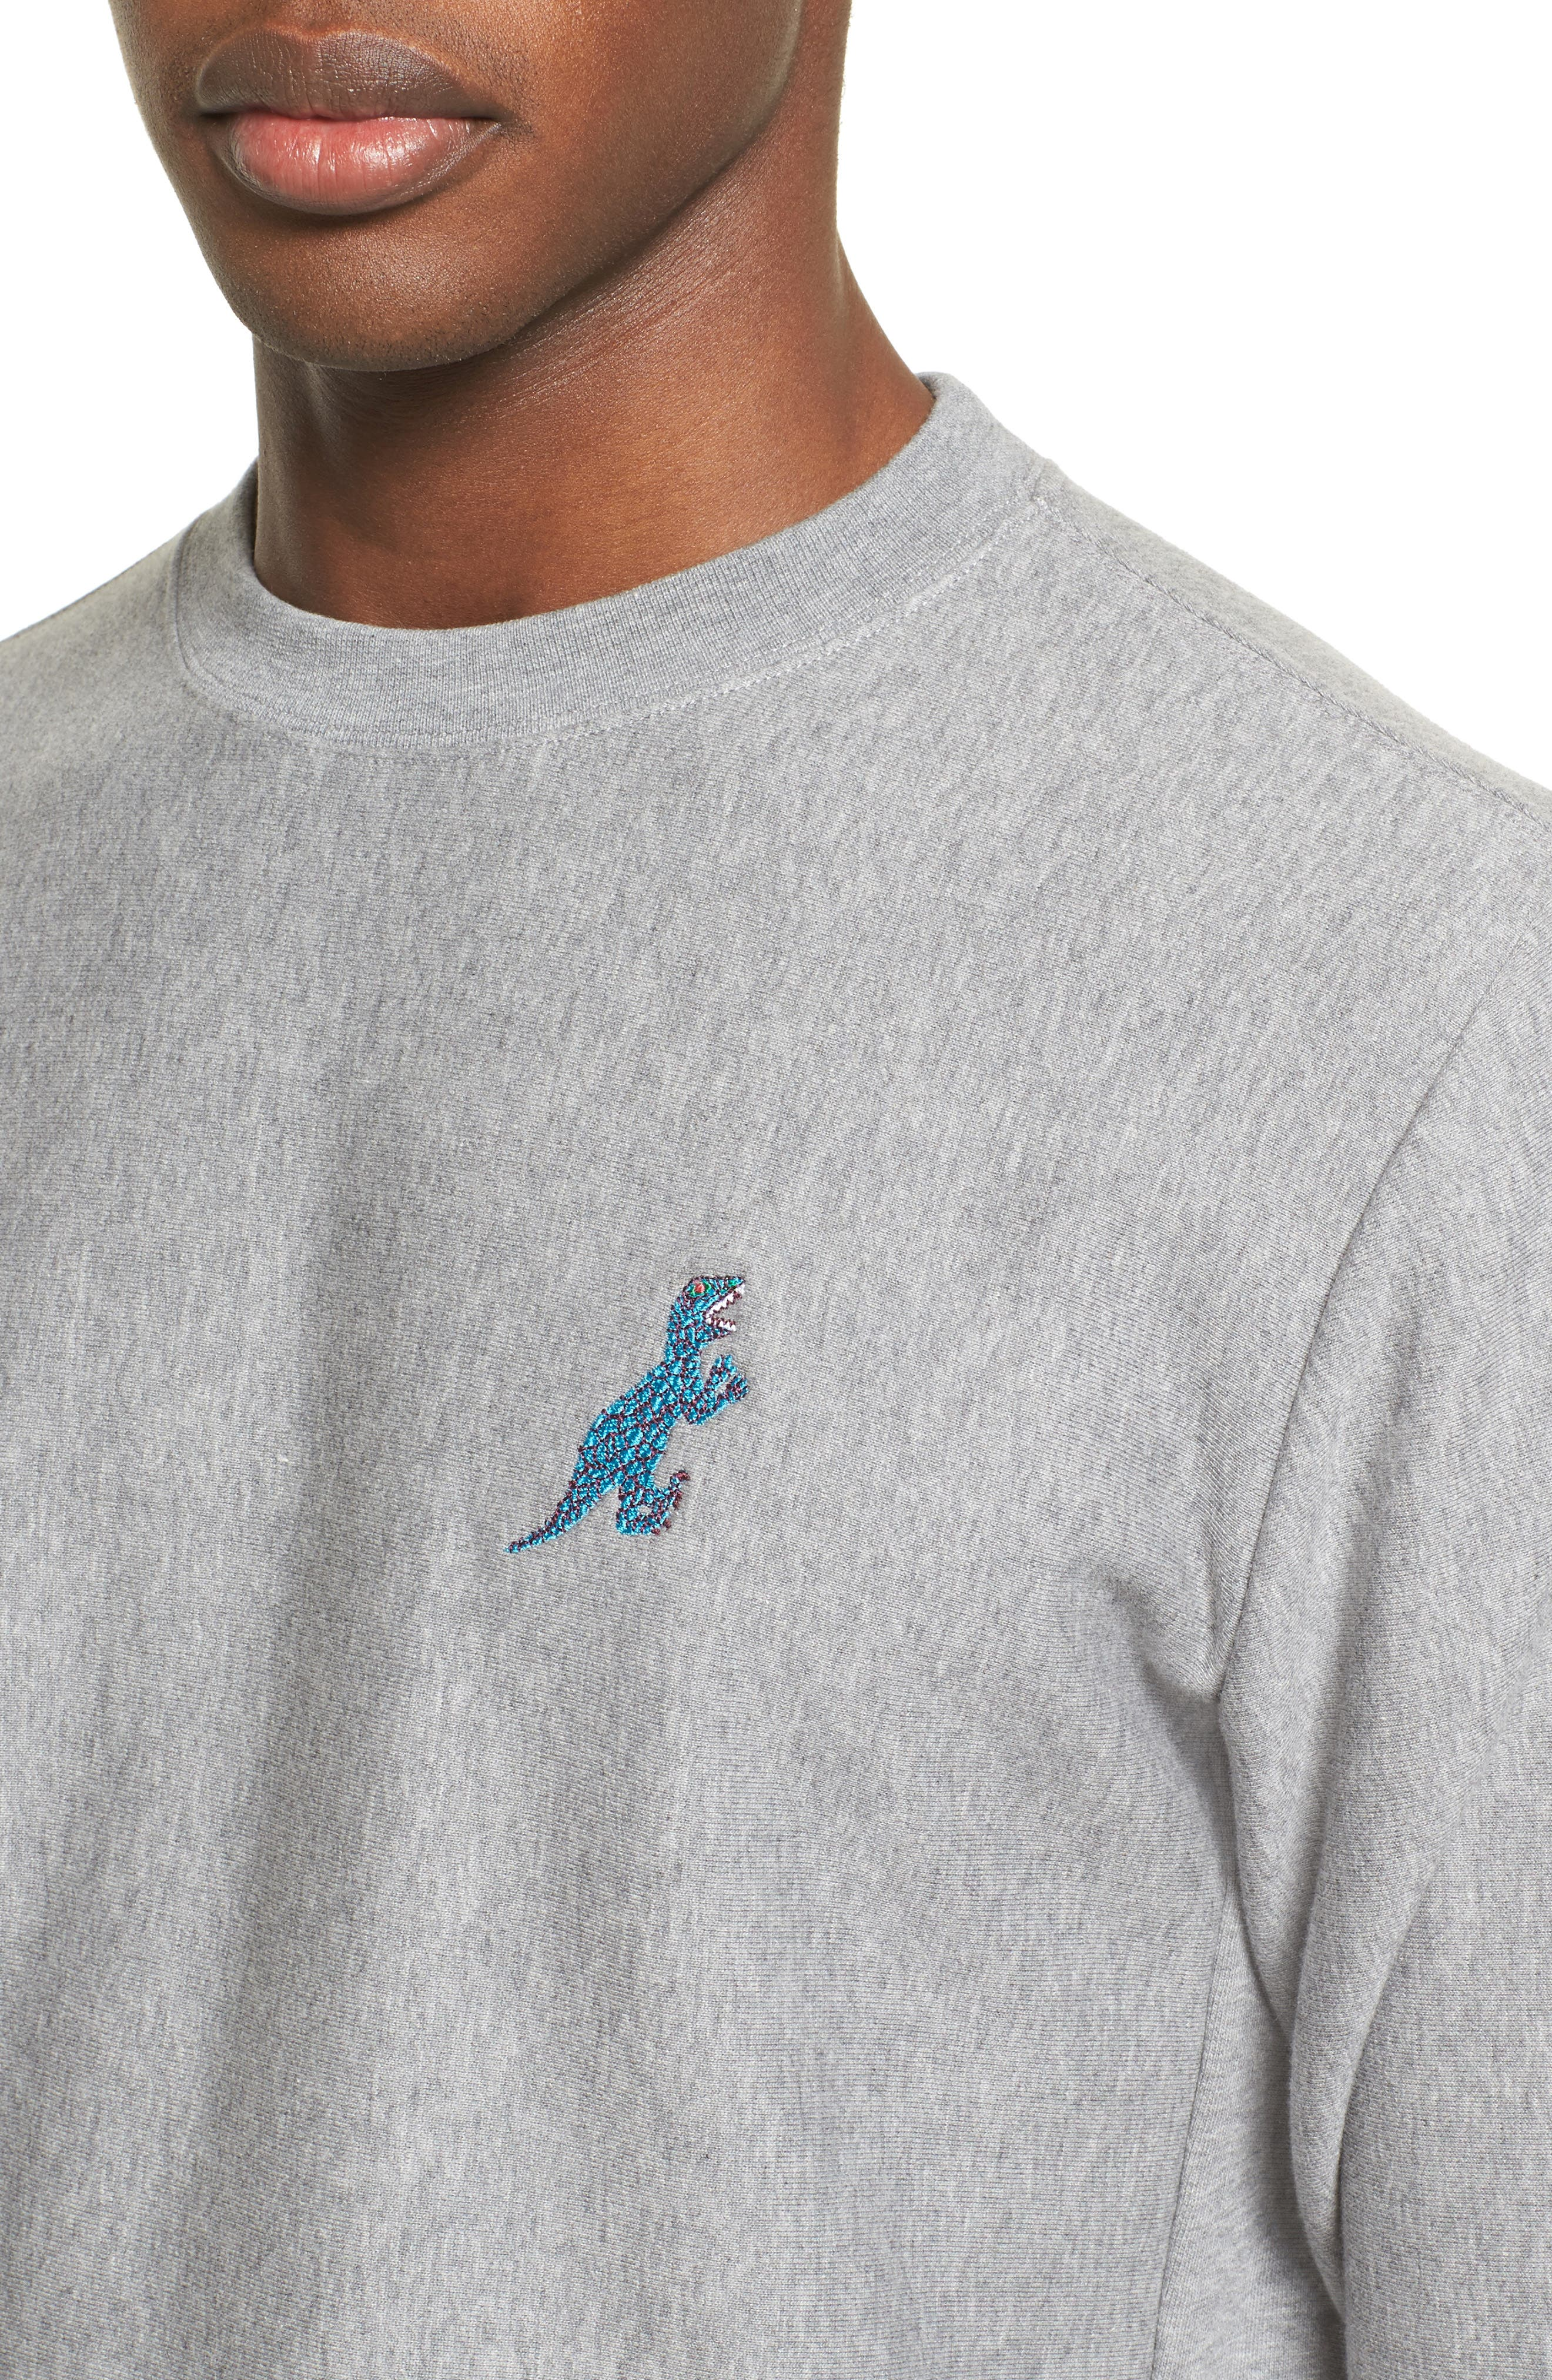 Alternate Image 4  - PS Paul Smith Dino Dino Embroidered Sweatshirt